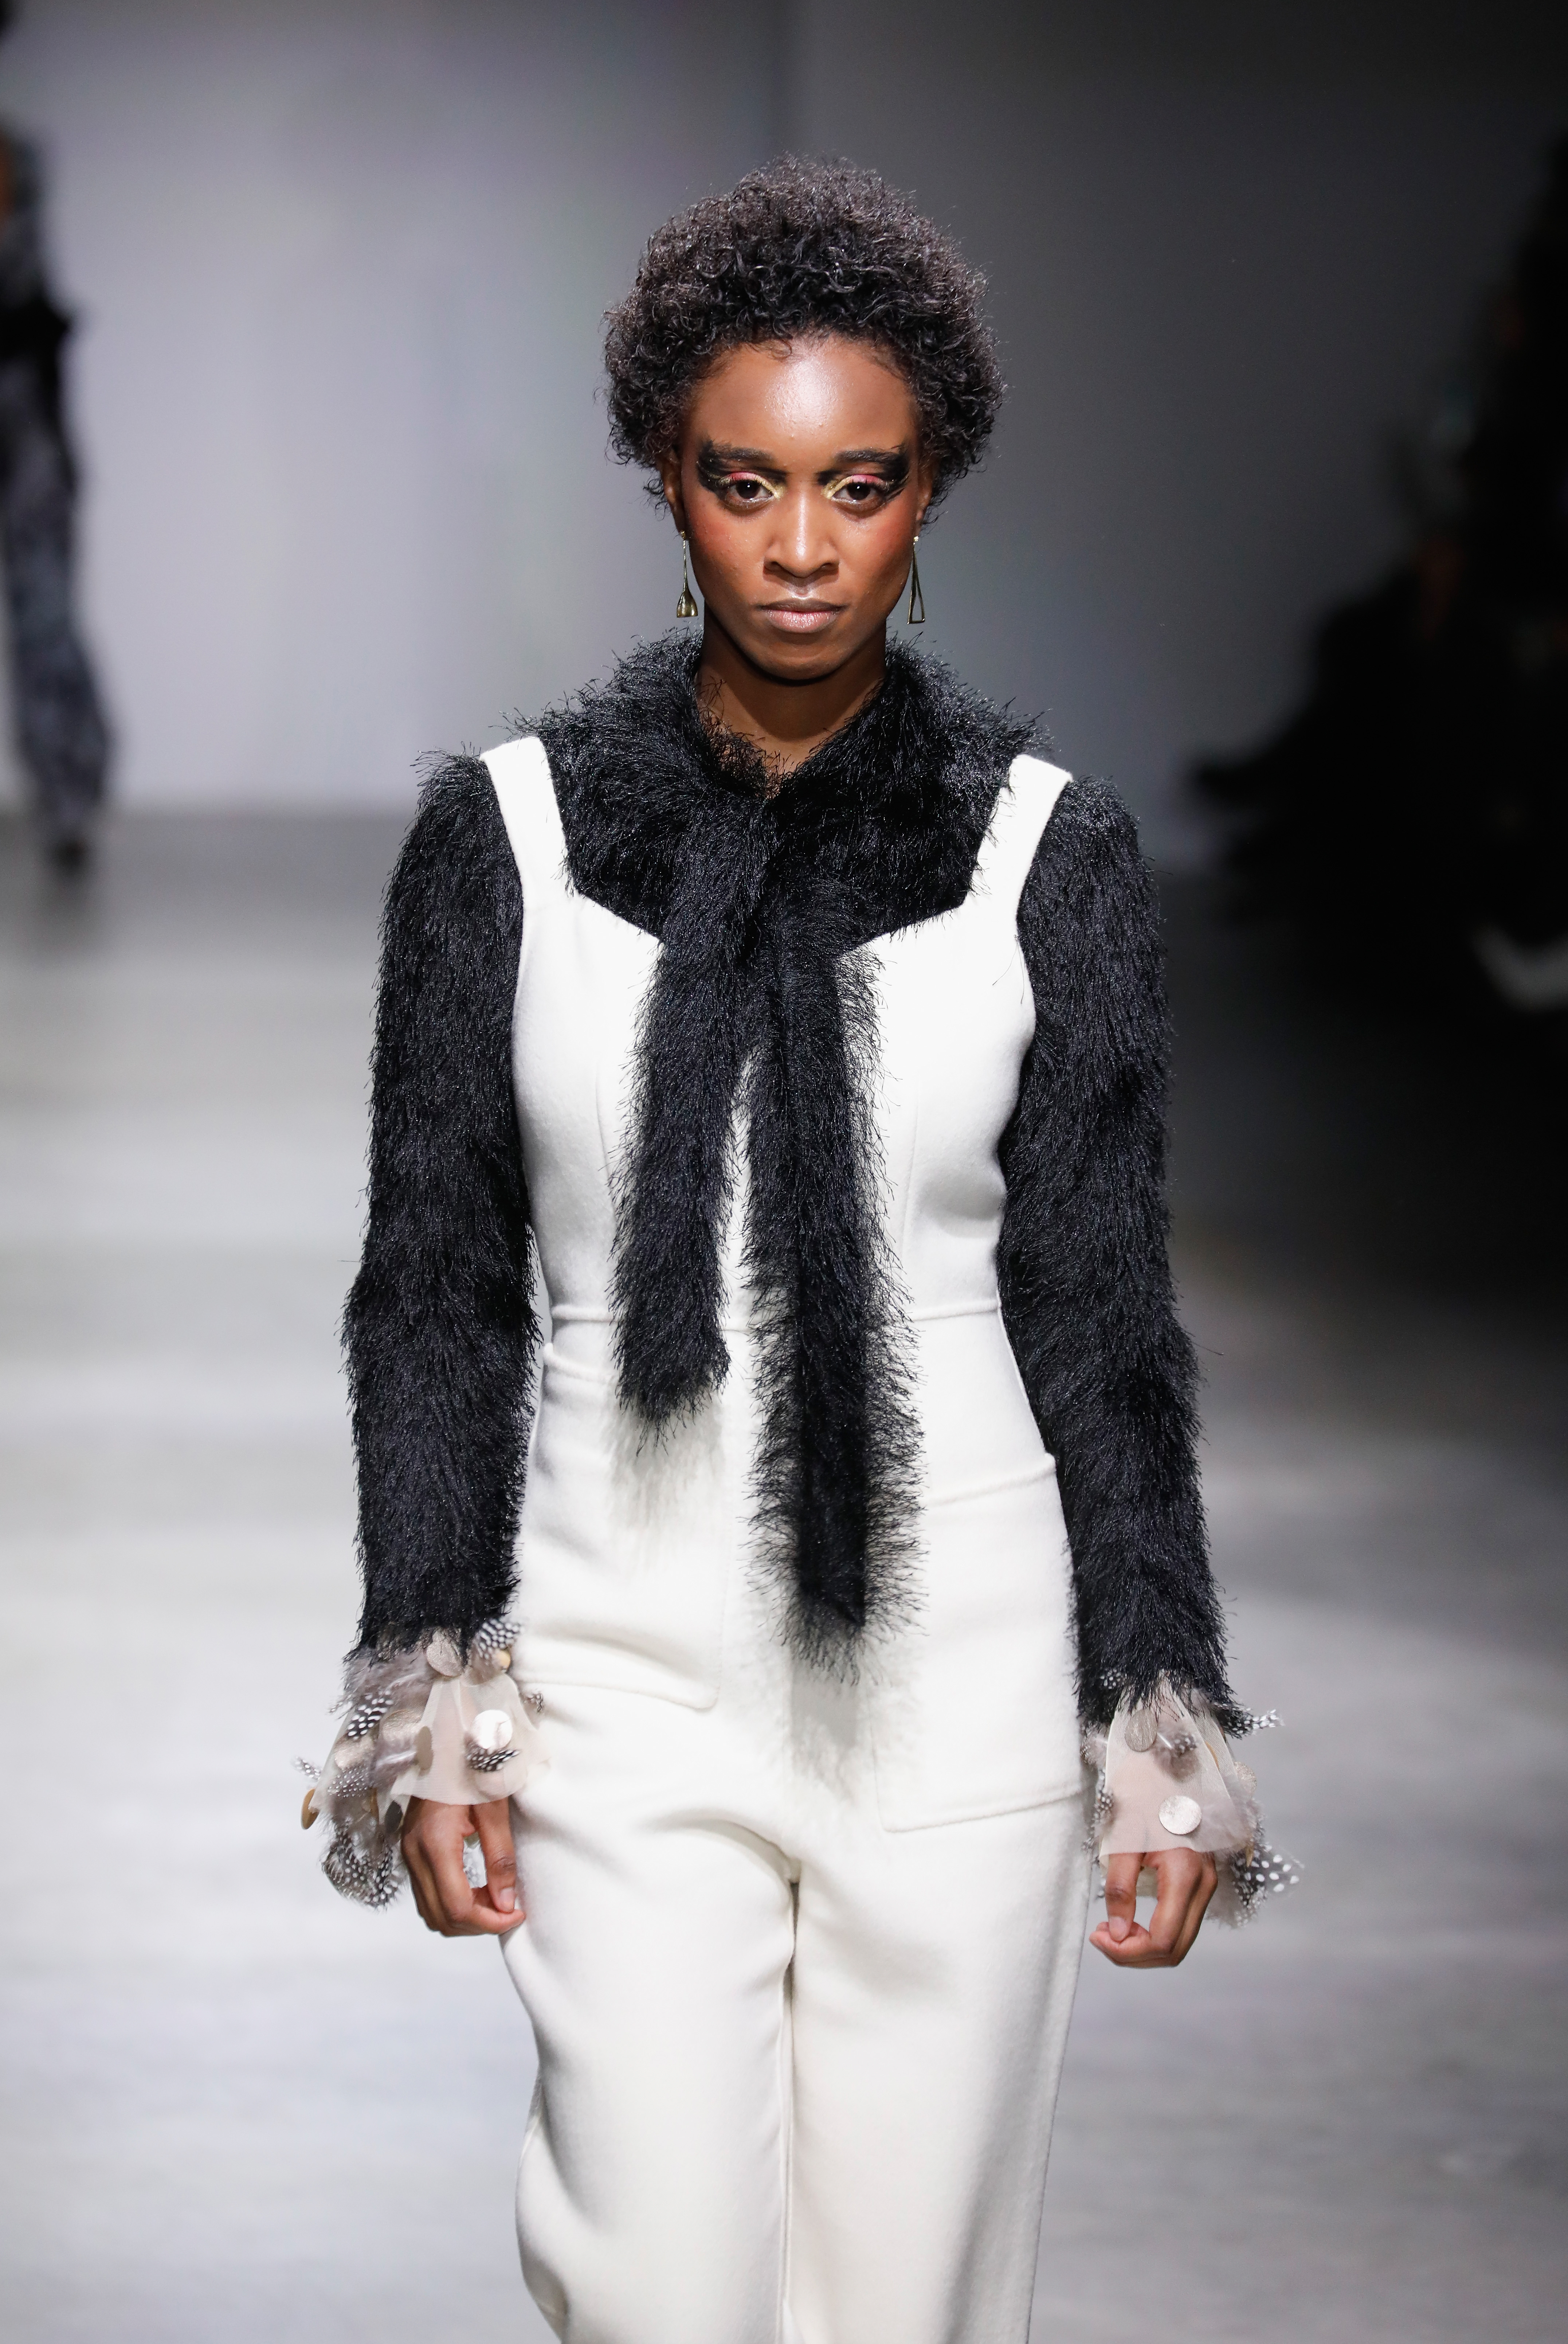 Nolcha Shows New York Fashion Week Fall Winter 2019 Presented By InstaSleep Mint Melts BENNOV Runway Show